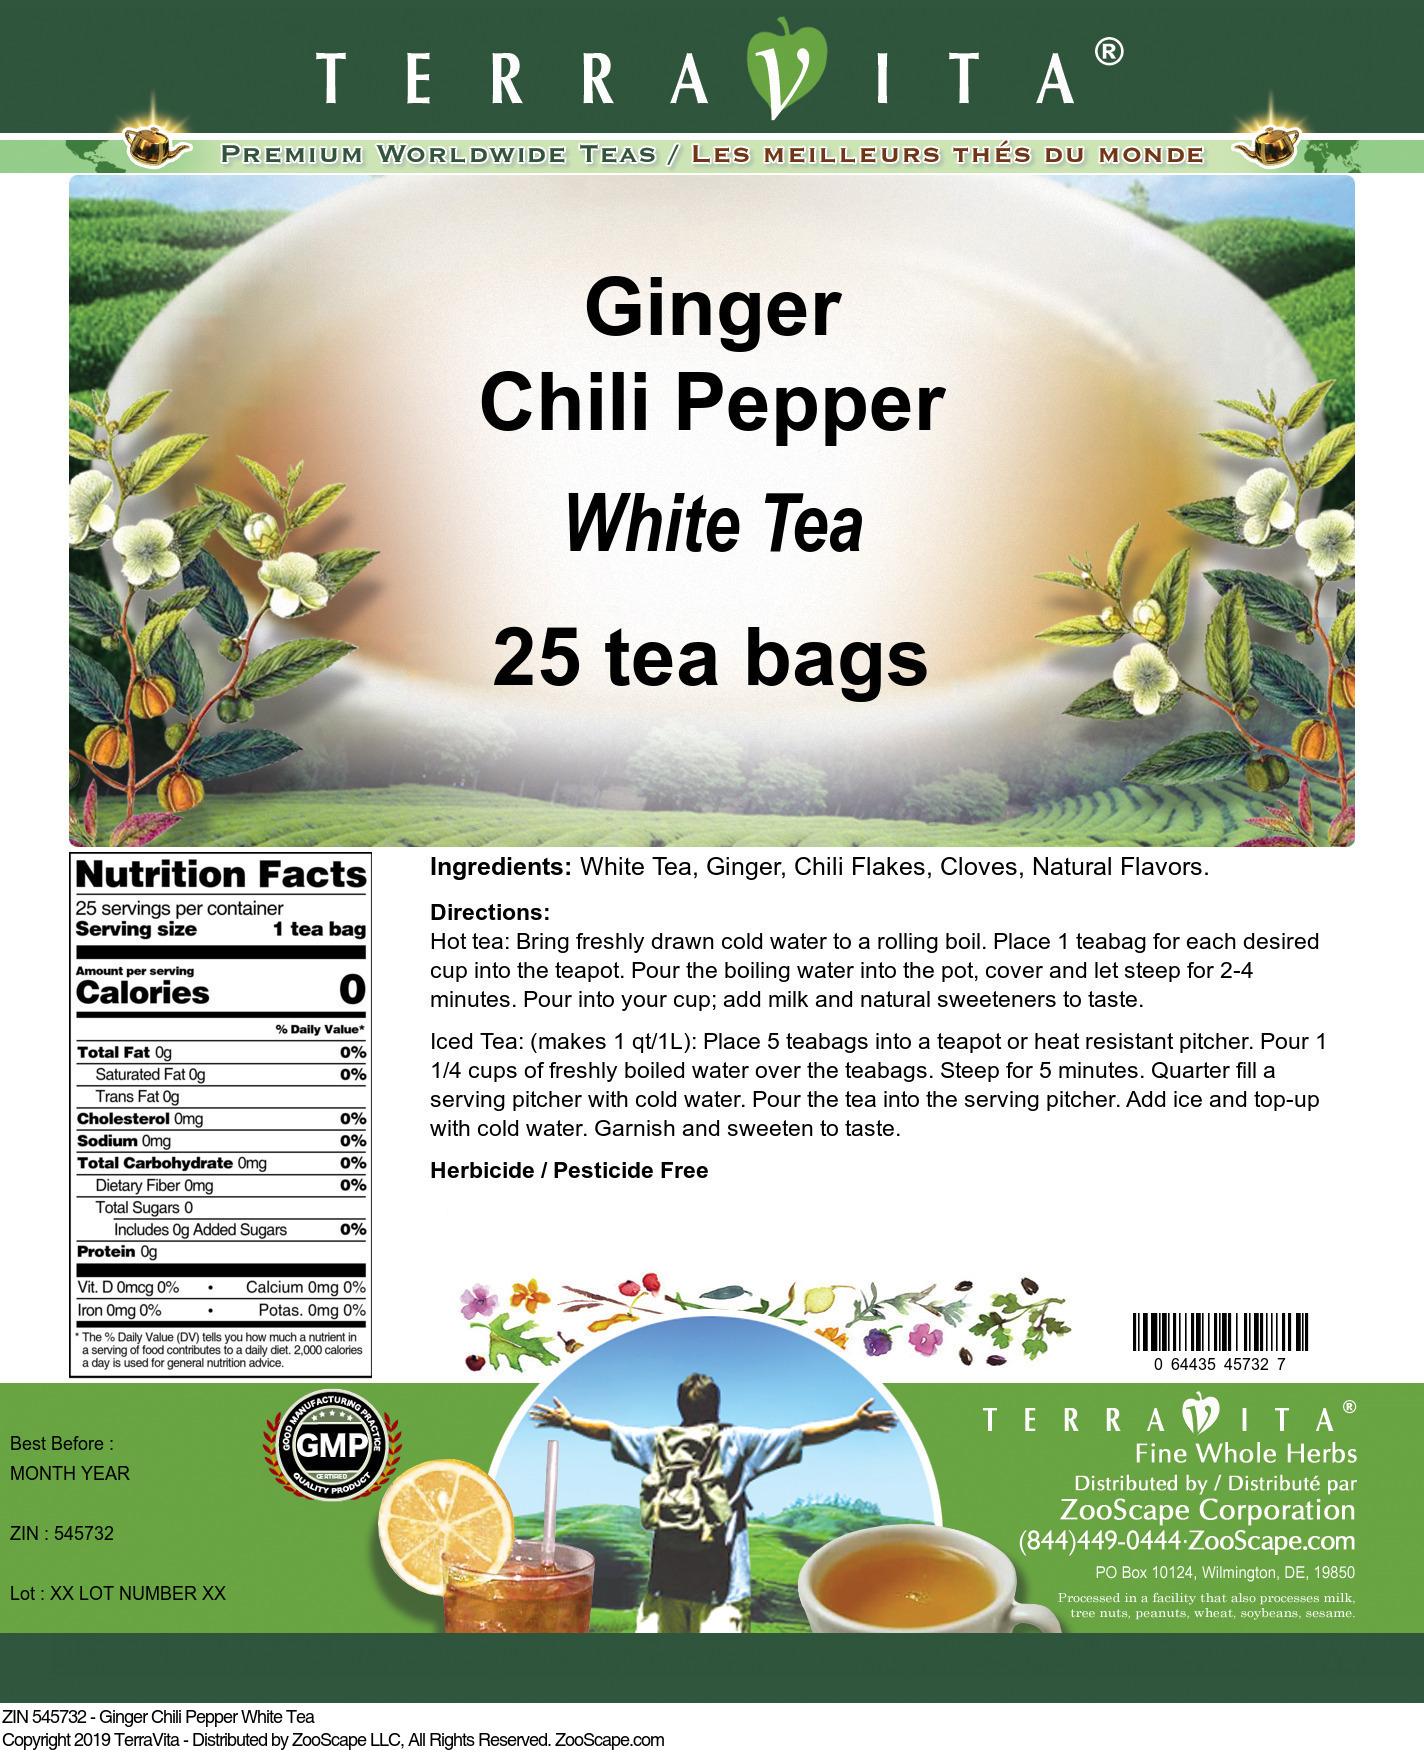 Ginger Chili Pepper White Tea